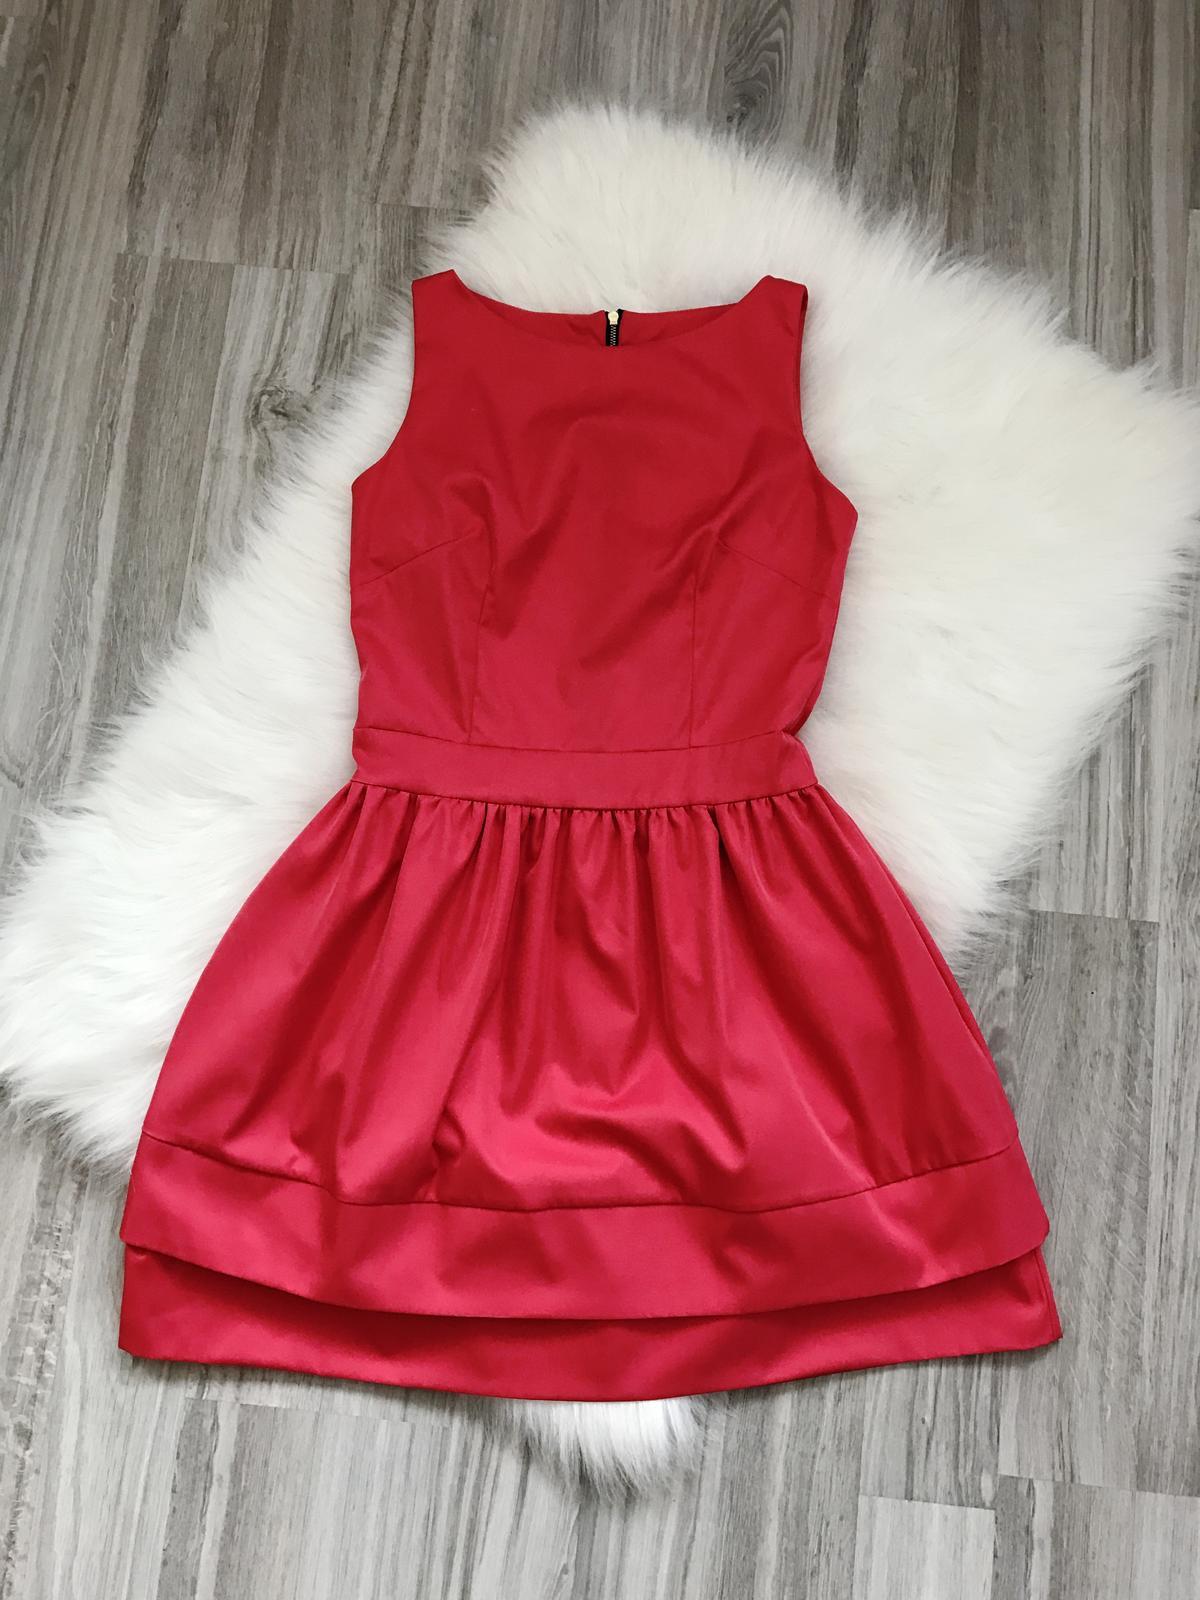 Spoločenské cyklaménové šaty - Obrázok č. 1